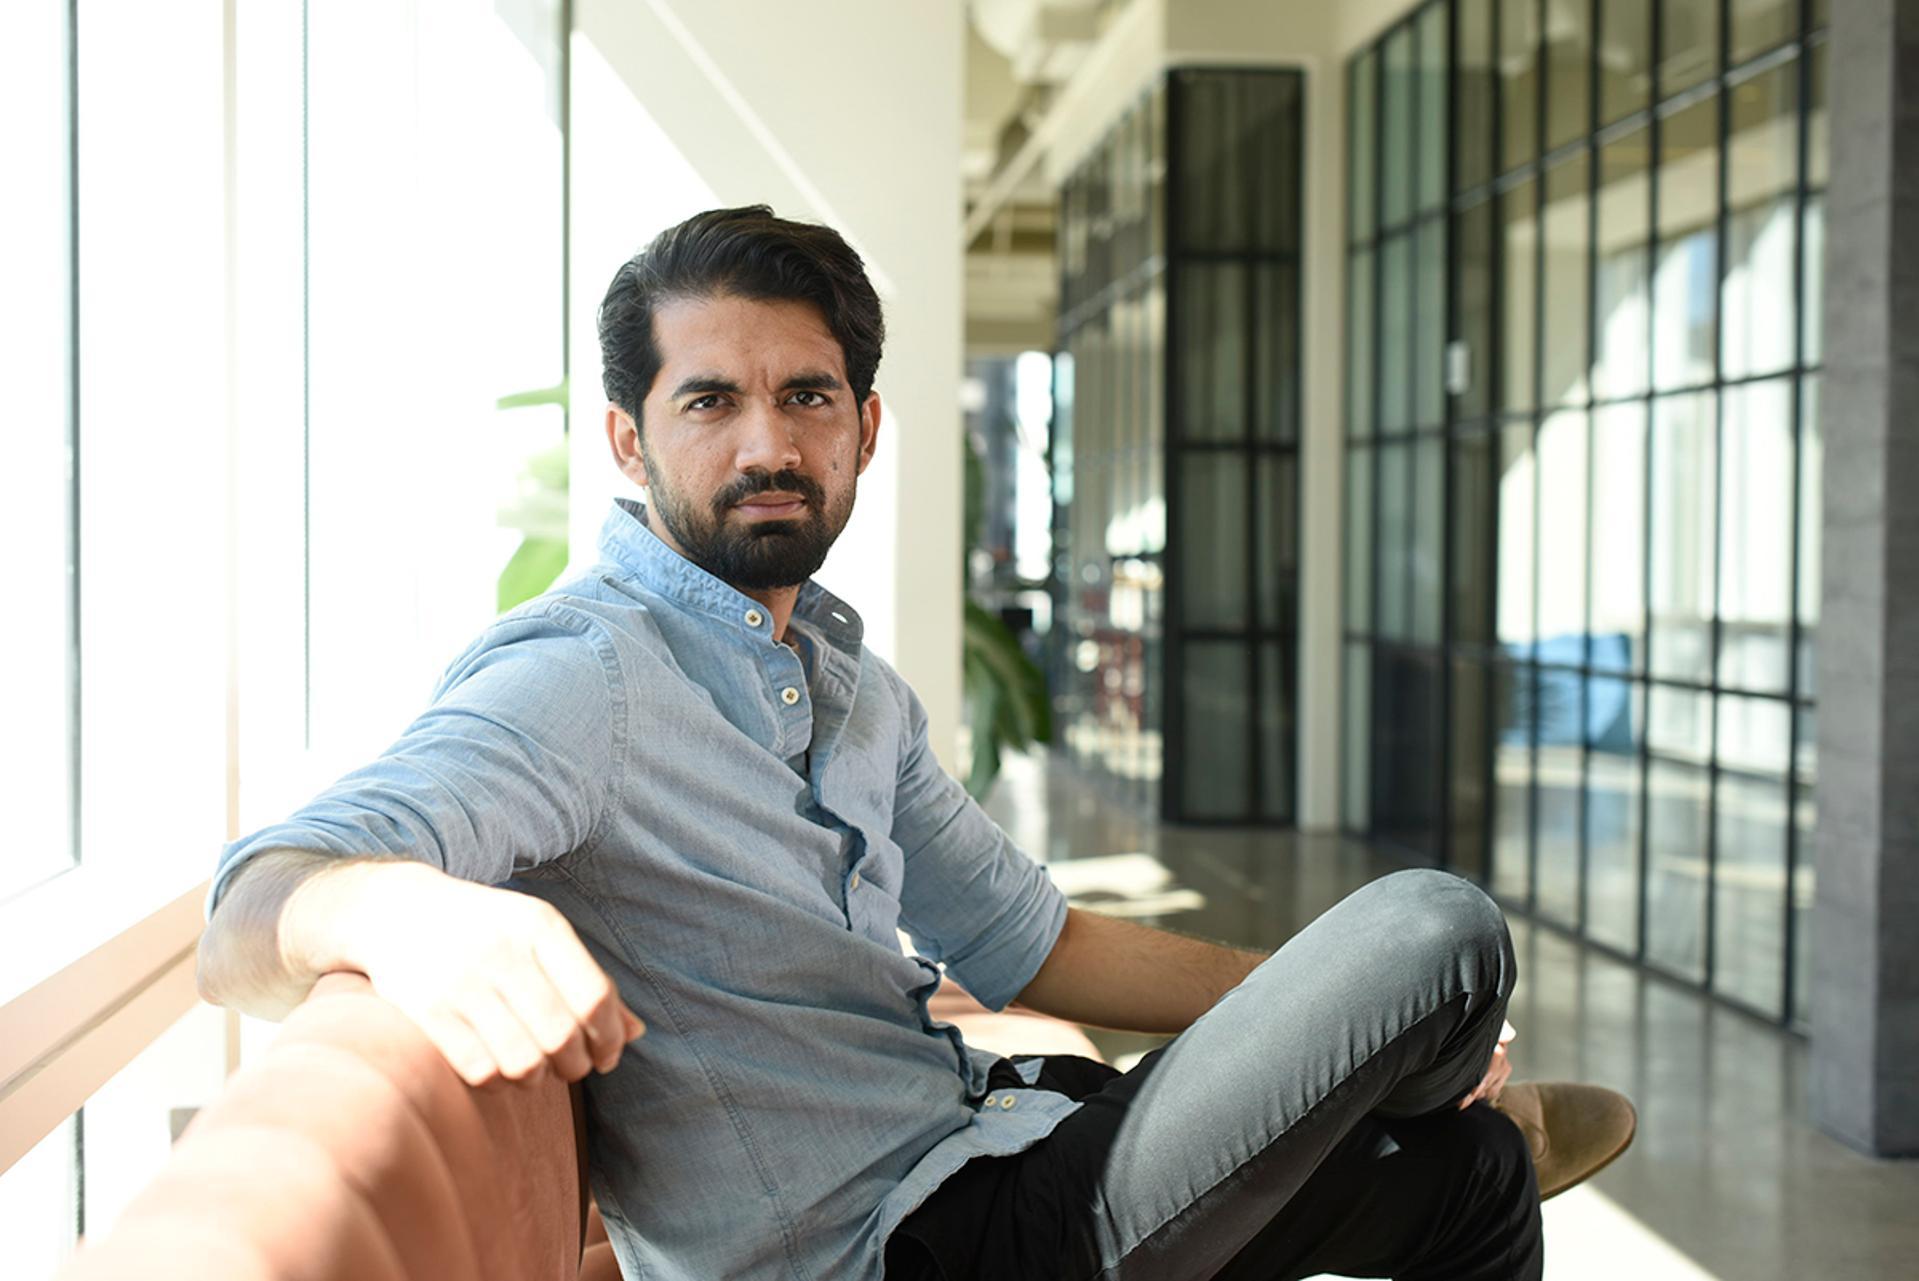 Synapse CEO Sankaet Pathak